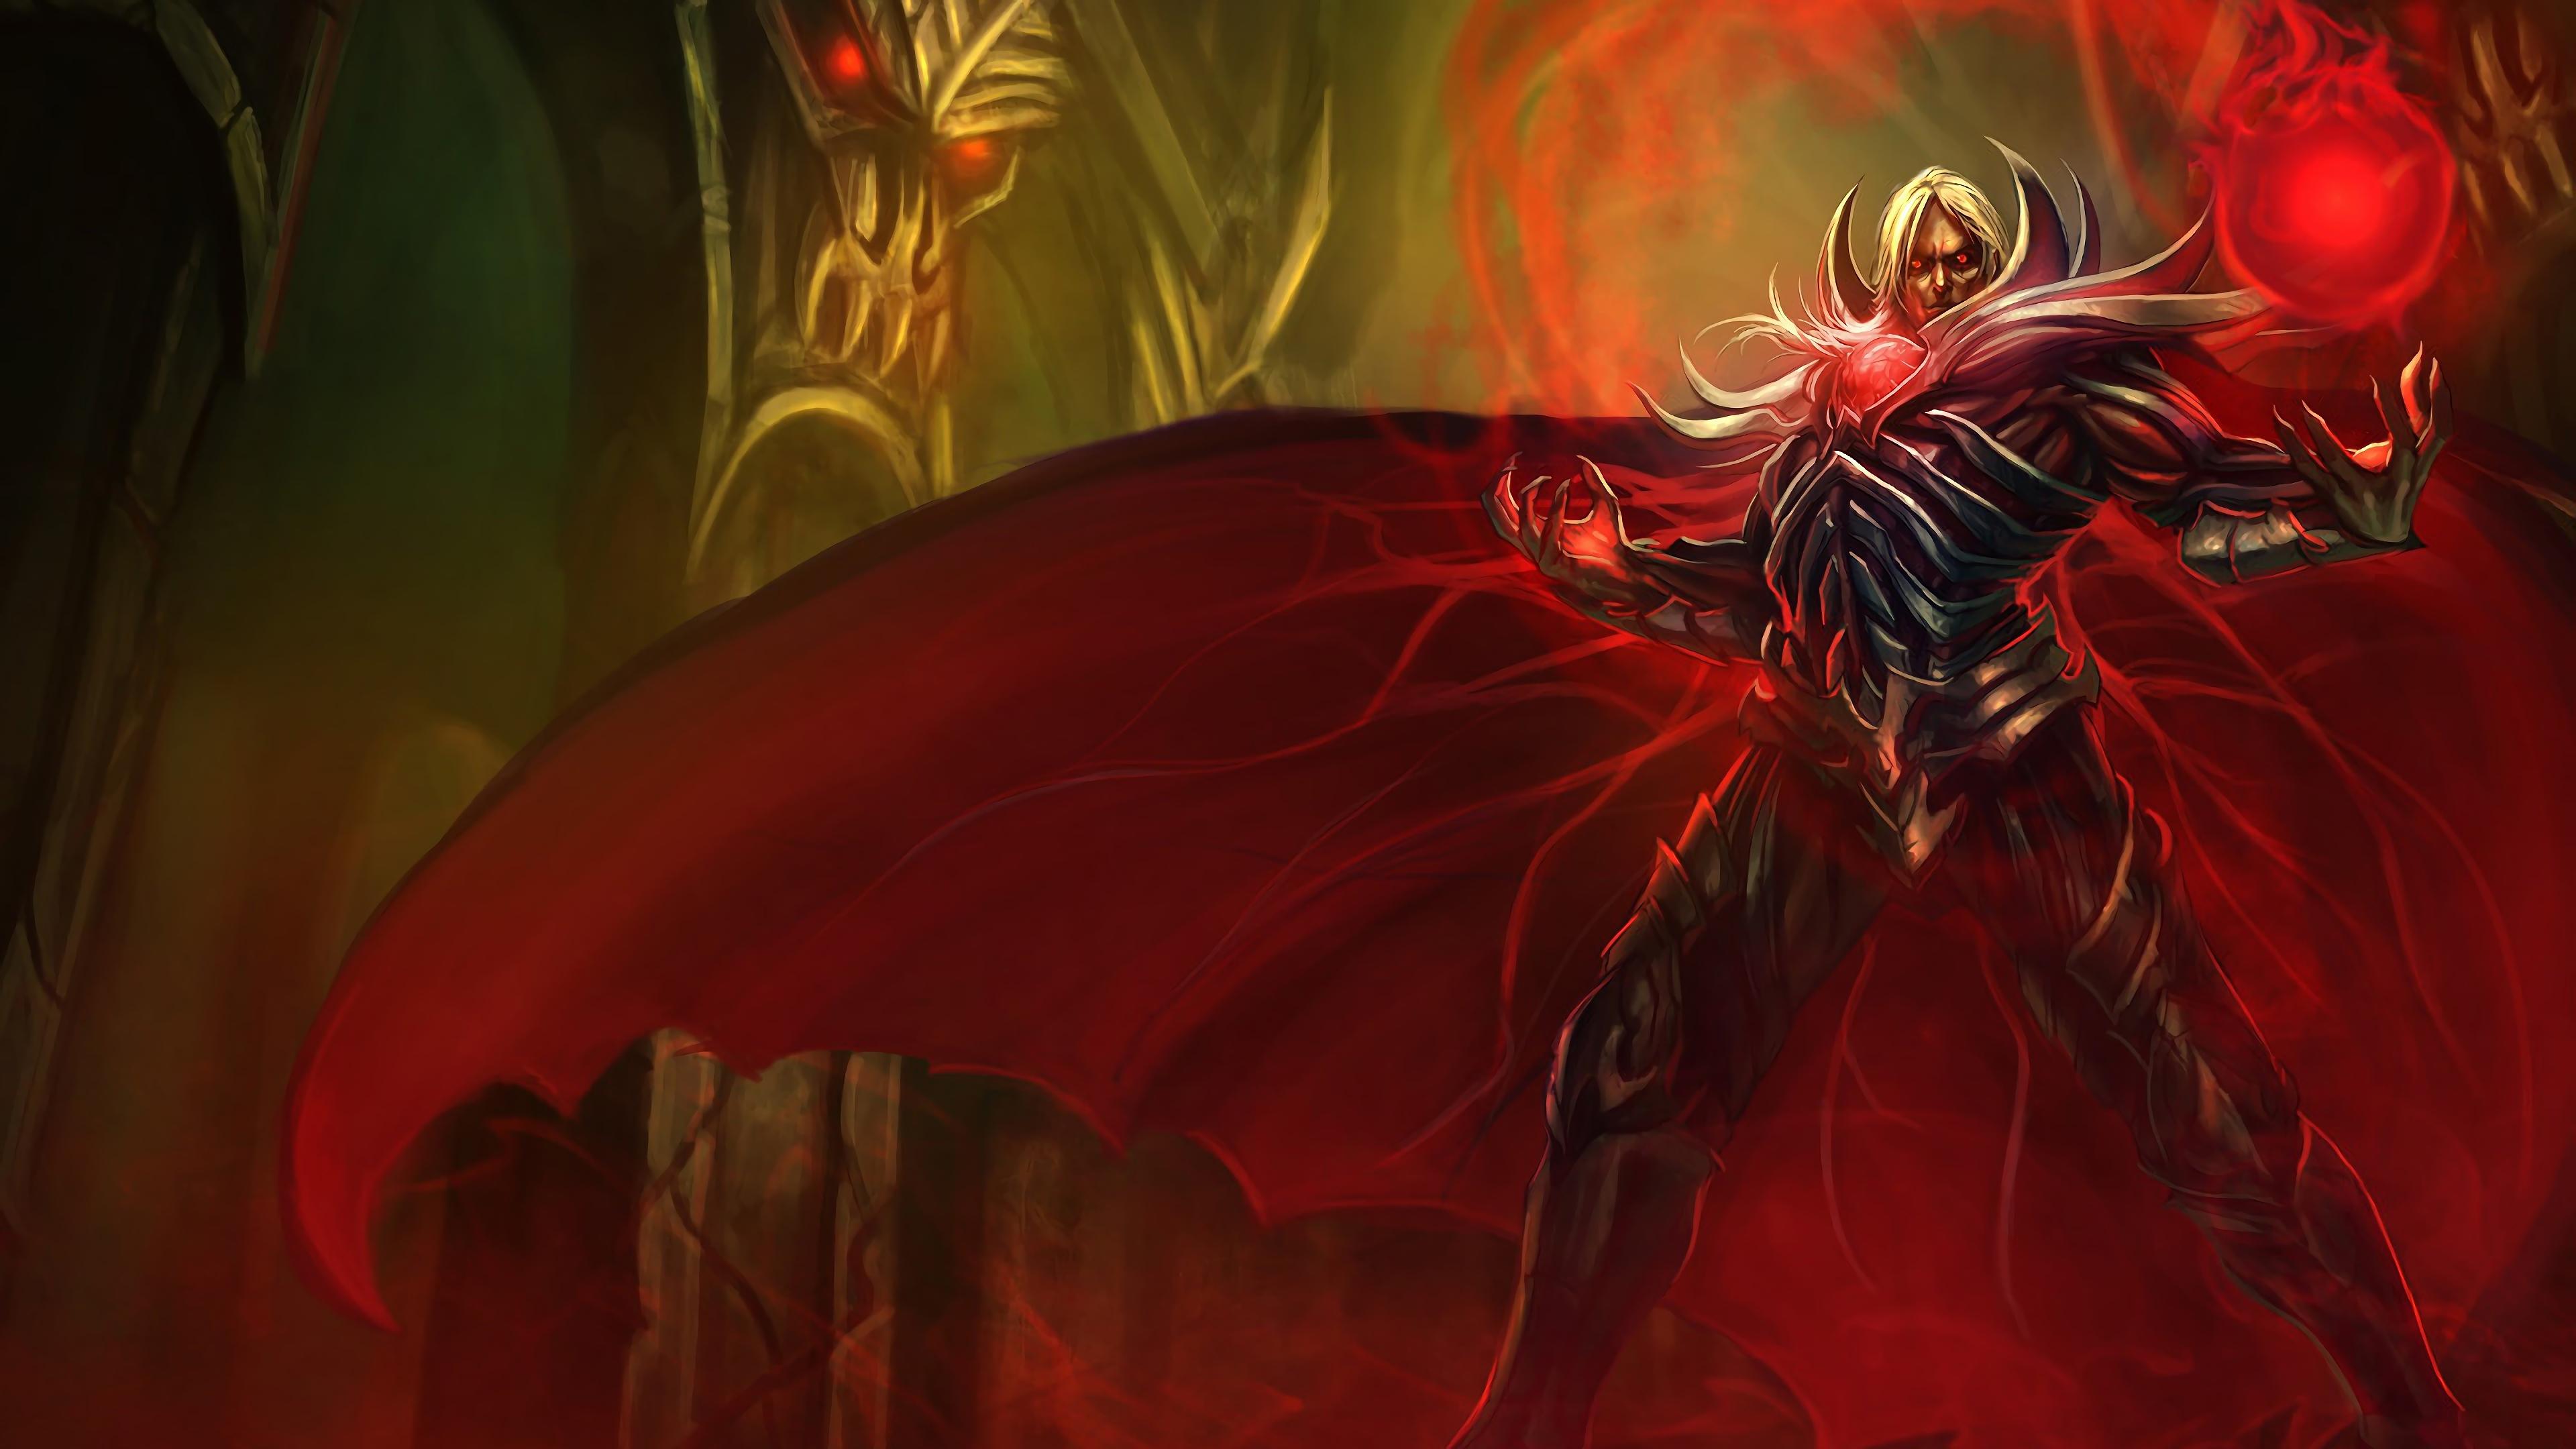 blood lord vladimir lol splash art league of legends 1574098015 - Blood Lord Vladimir LoL Splash Art League of Legends - Vladimir, league of legends